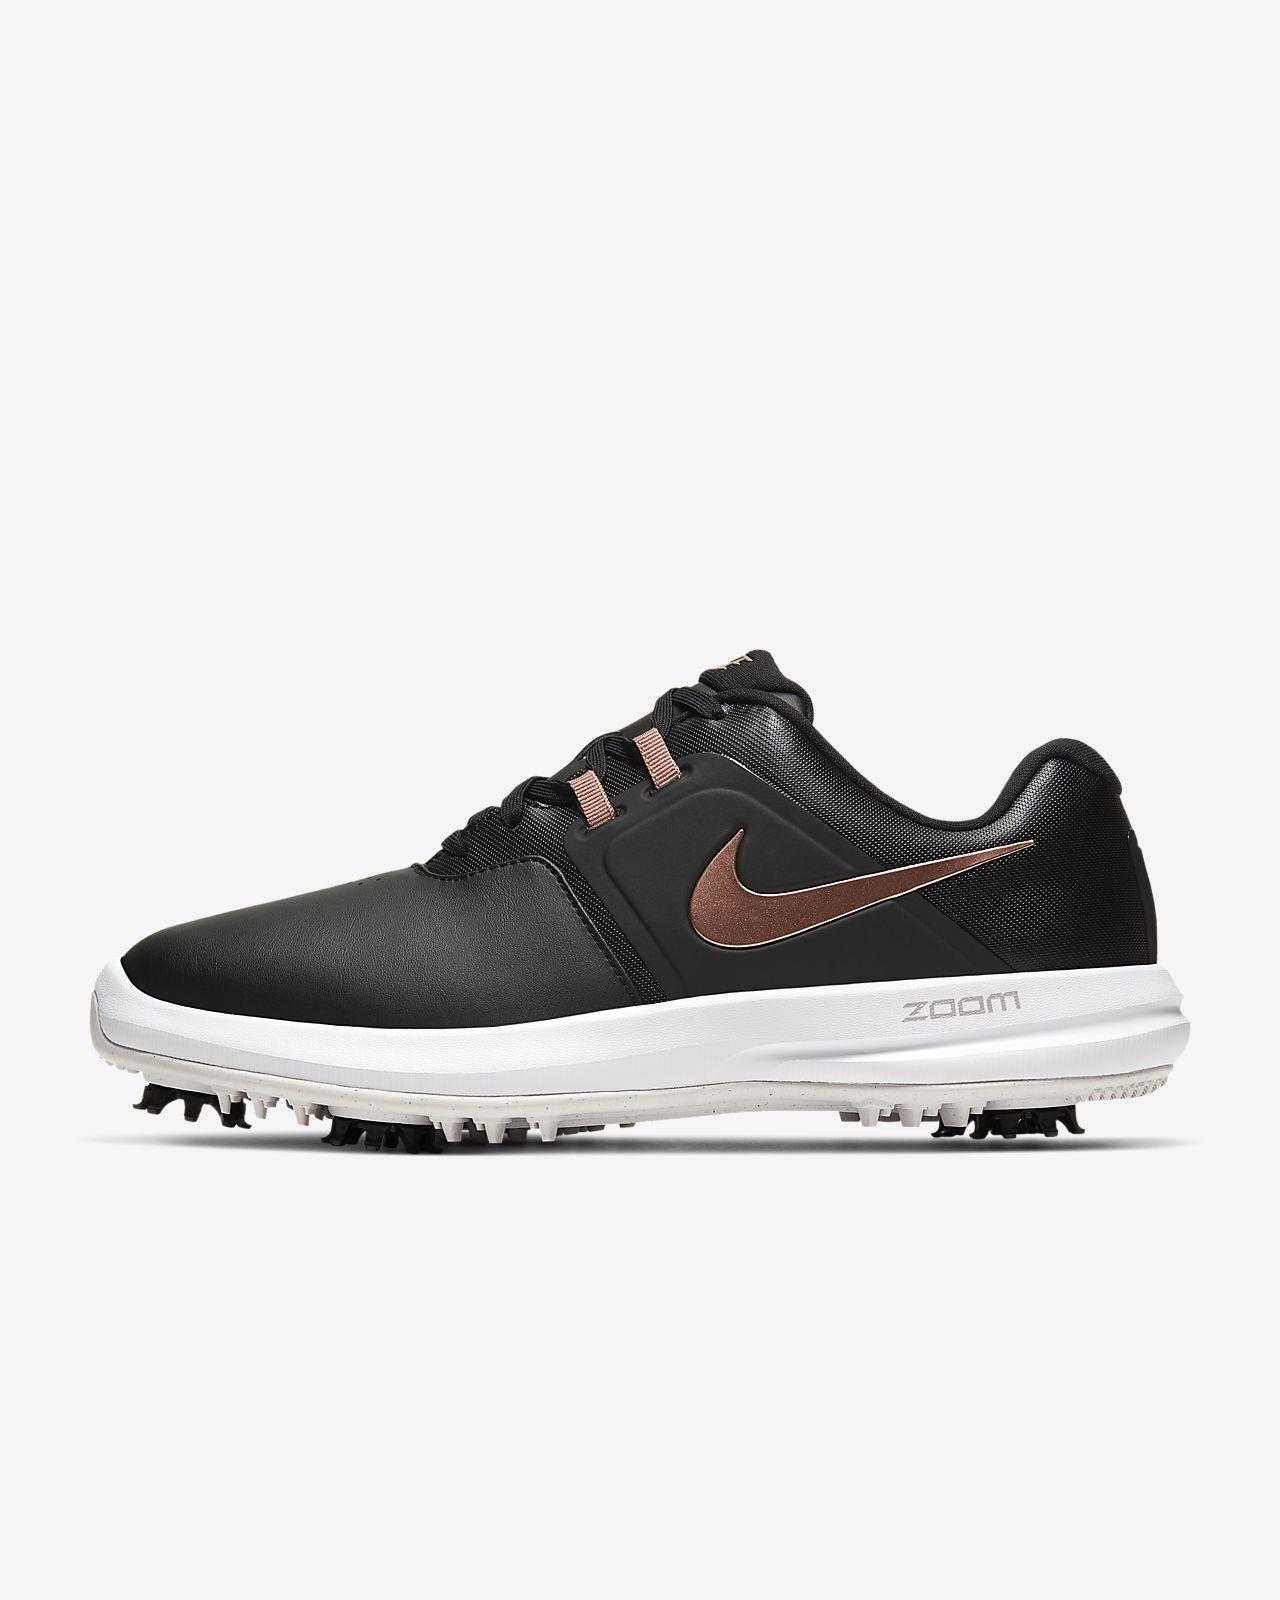 finest selection 7b2e8 fee14 ... Chaussure de golf Nike Air Zoom Victory pour Femme